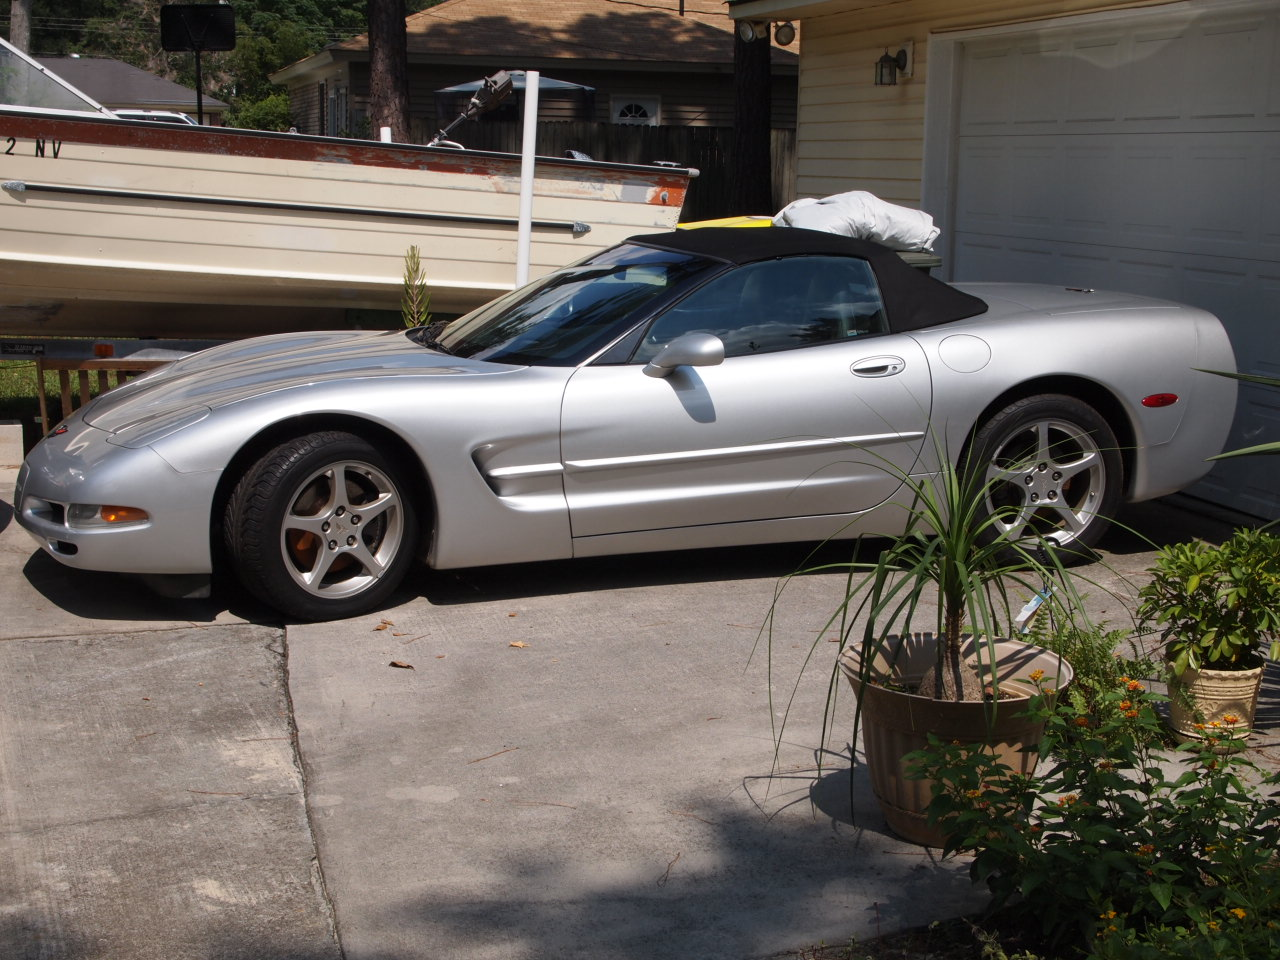 2002 chevrolet corvette for sale in savannah ga cargurus. Black Bedroom Furniture Sets. Home Design Ideas